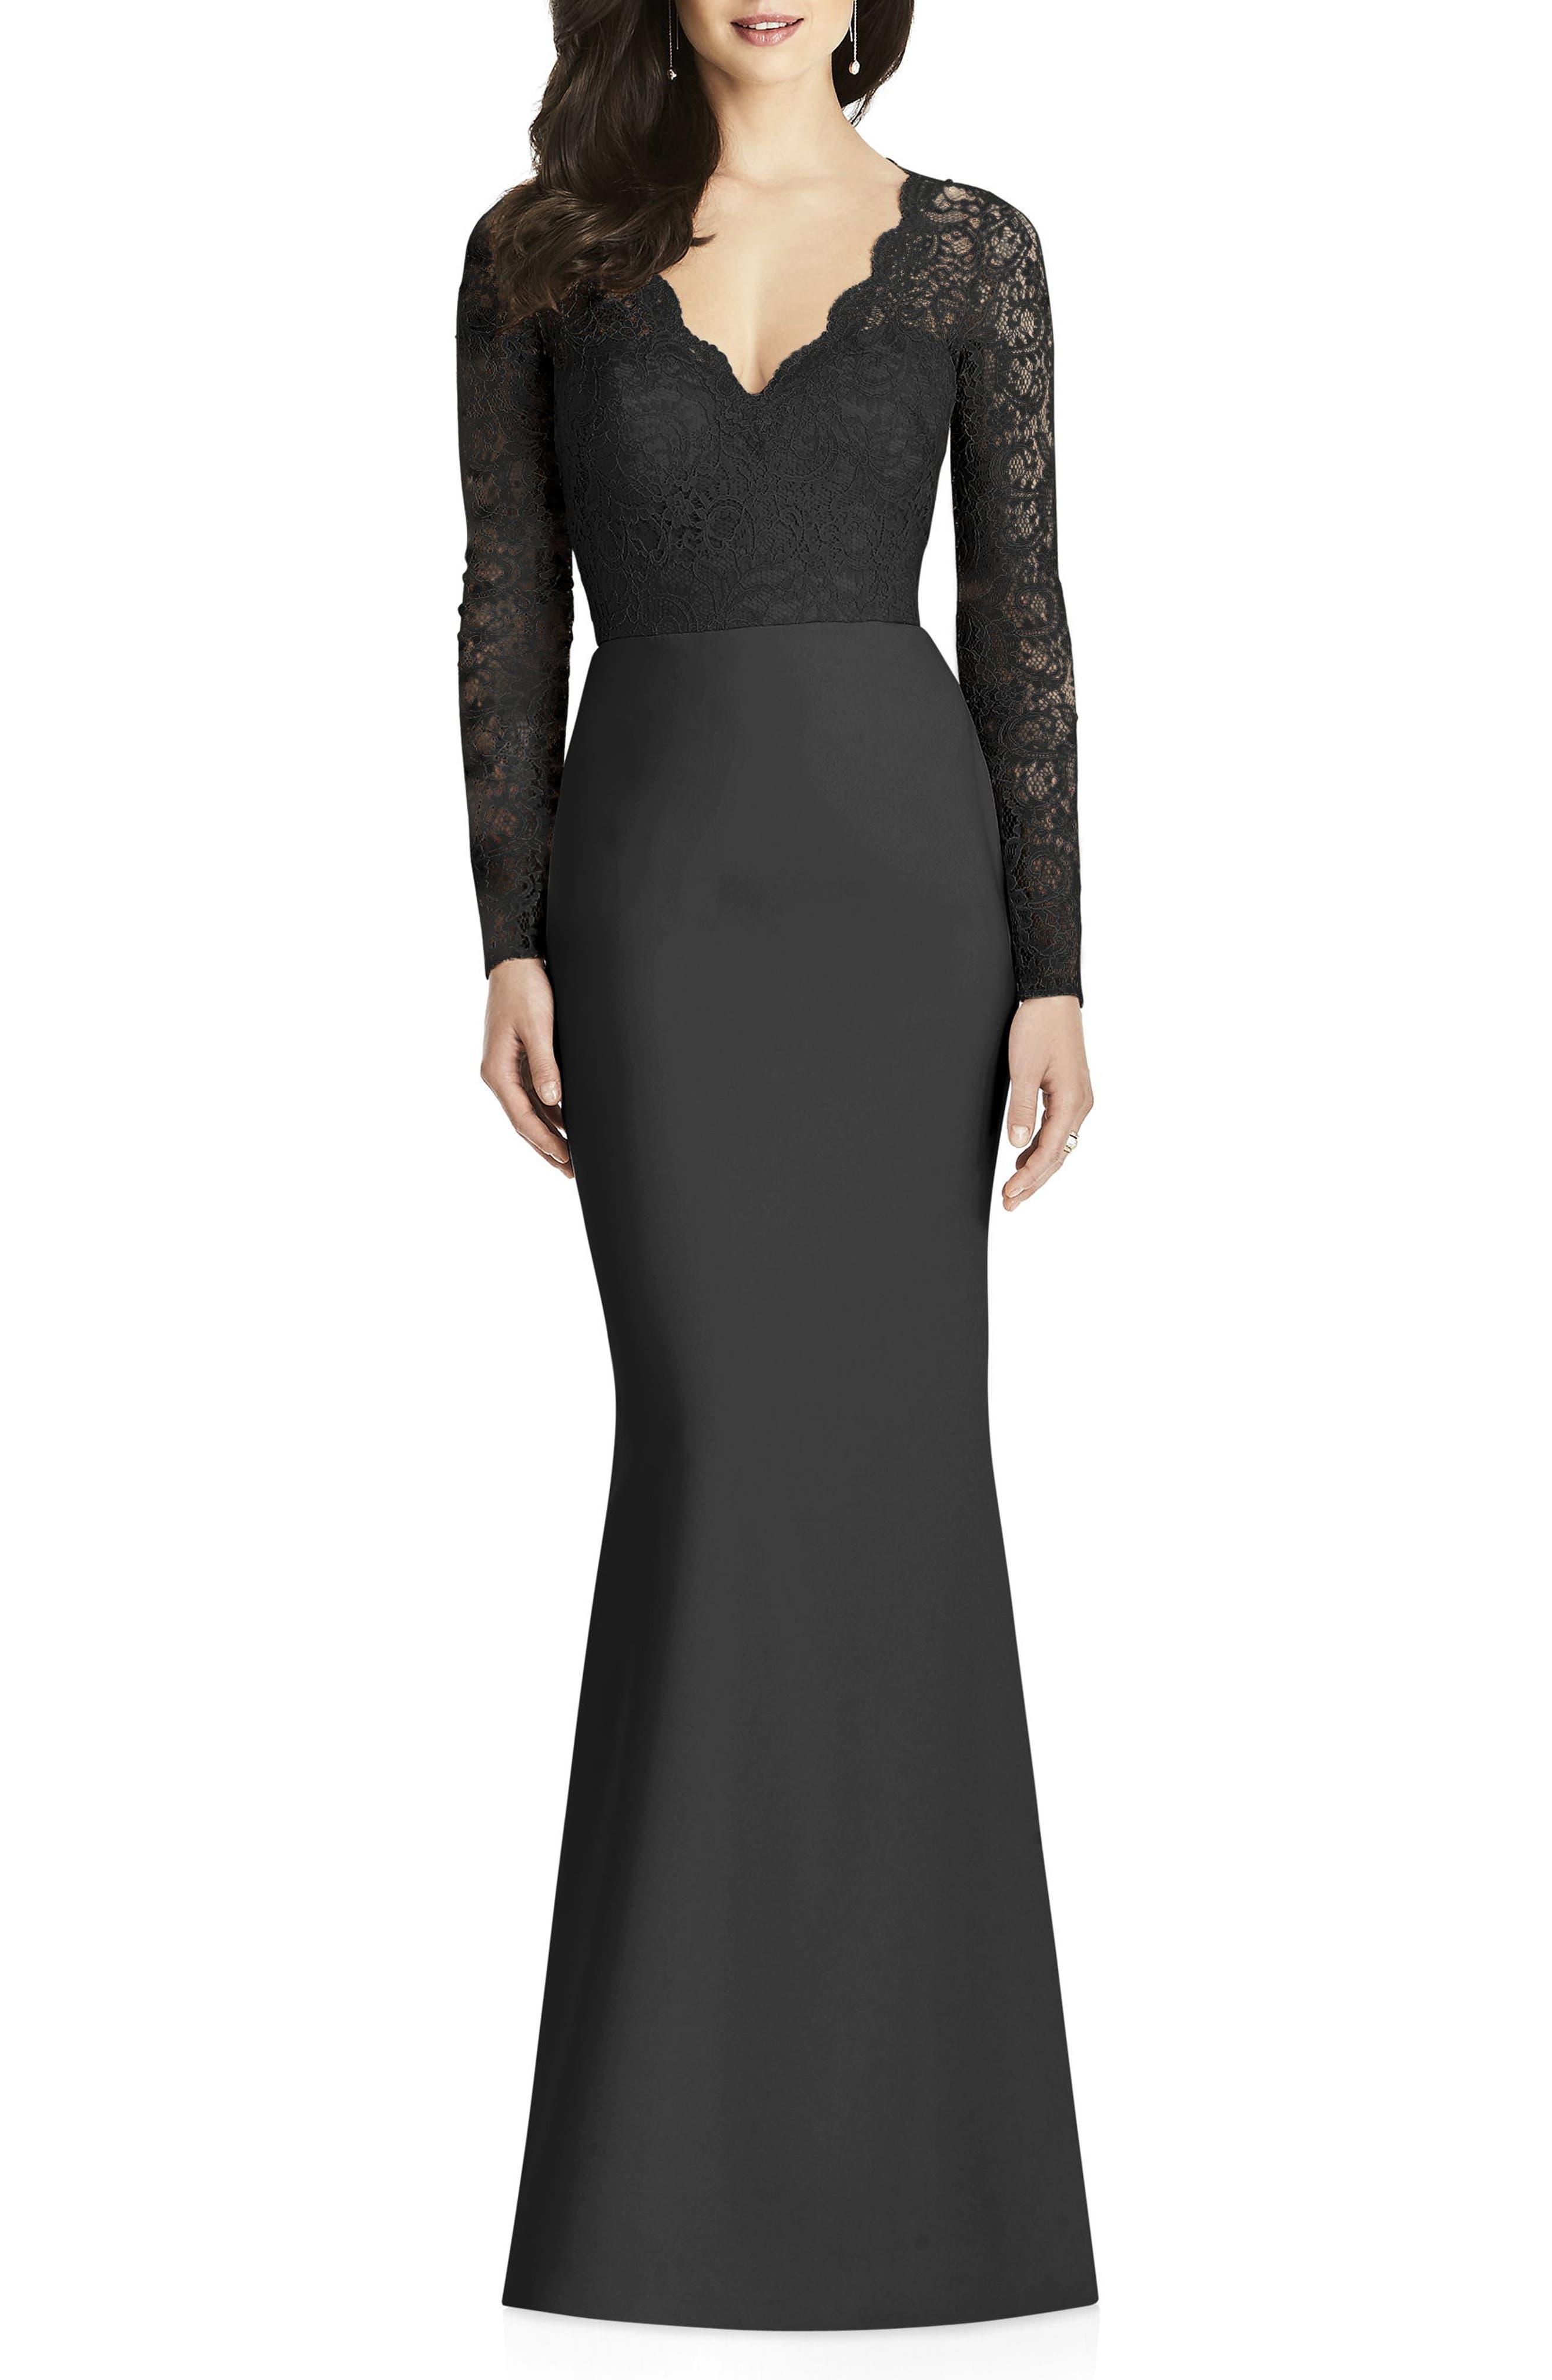 9b8f05f35370c Women's Long Sleeve Dresses | Nordstrom